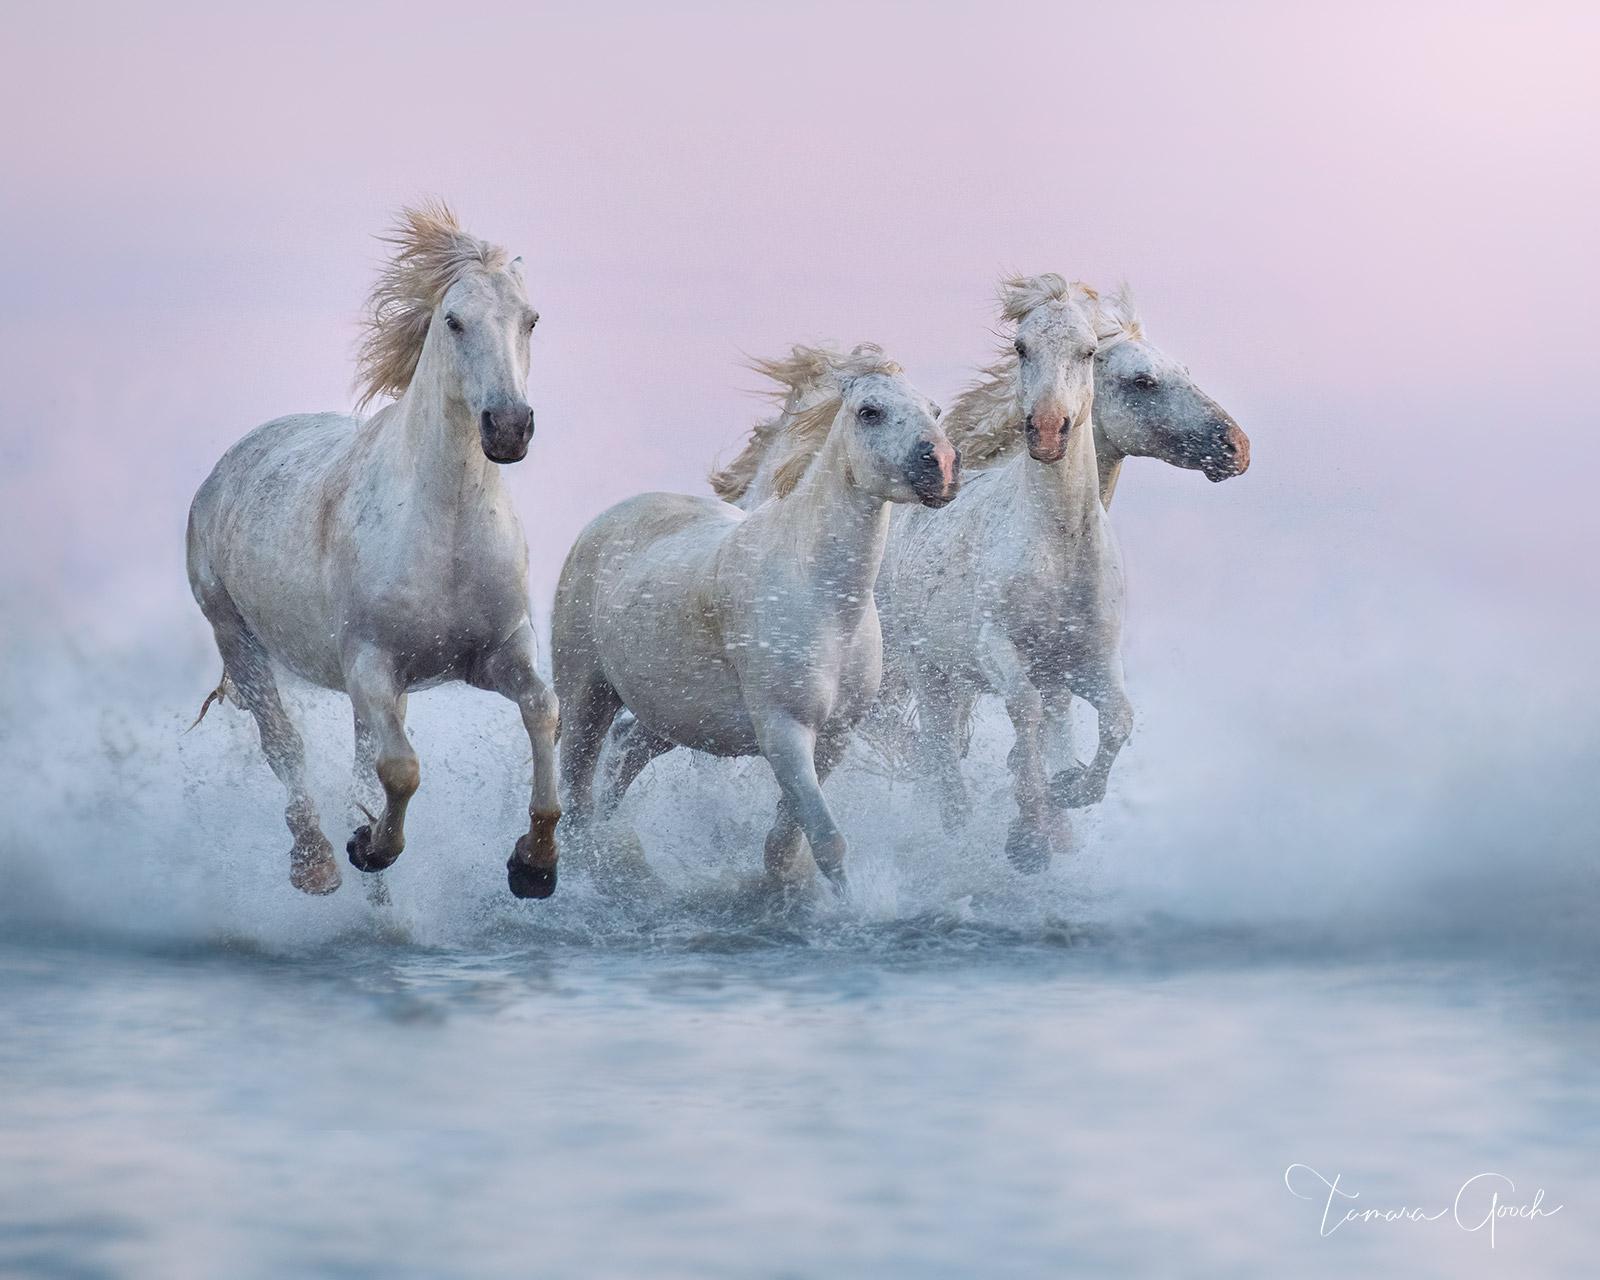 Camargue, France, marsh, water, sea, ocean, water, splashing, white horses, Provence, horse, horses, horse photos, horse photographer, horse photography, photographer, Idaho, equine, equine photograph, photo